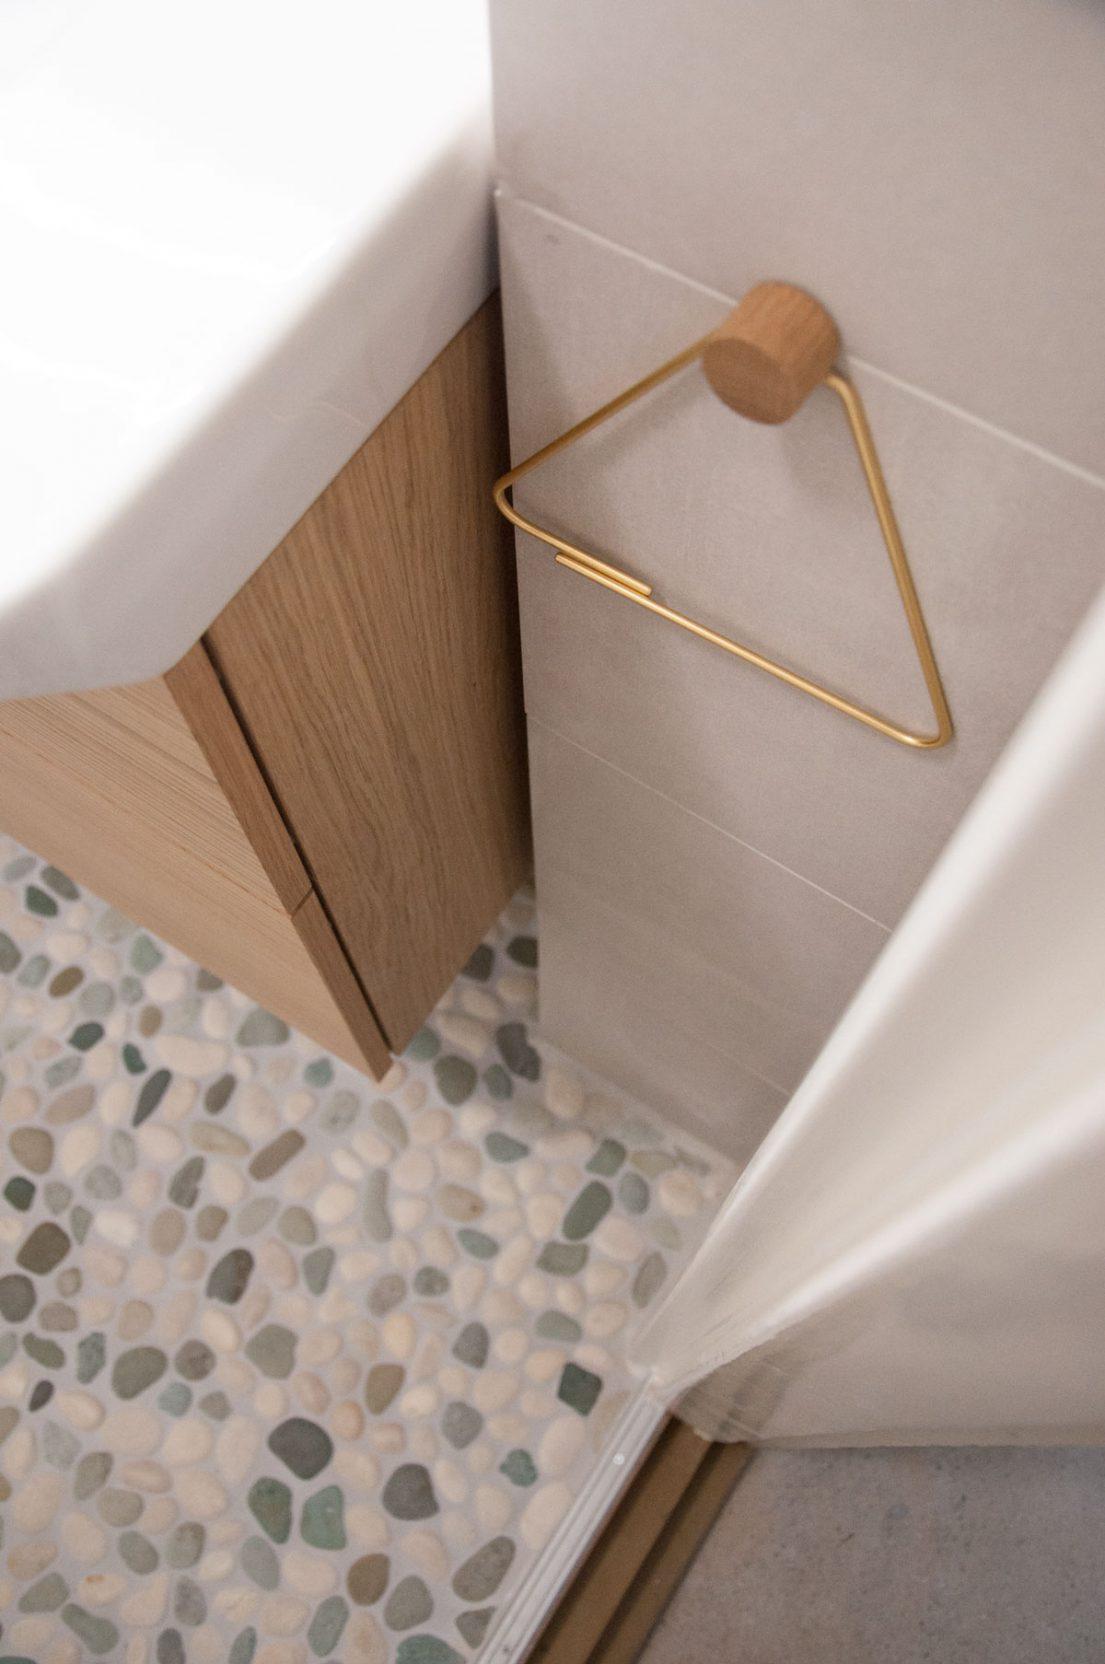 Fermin siro wc-paperiteline